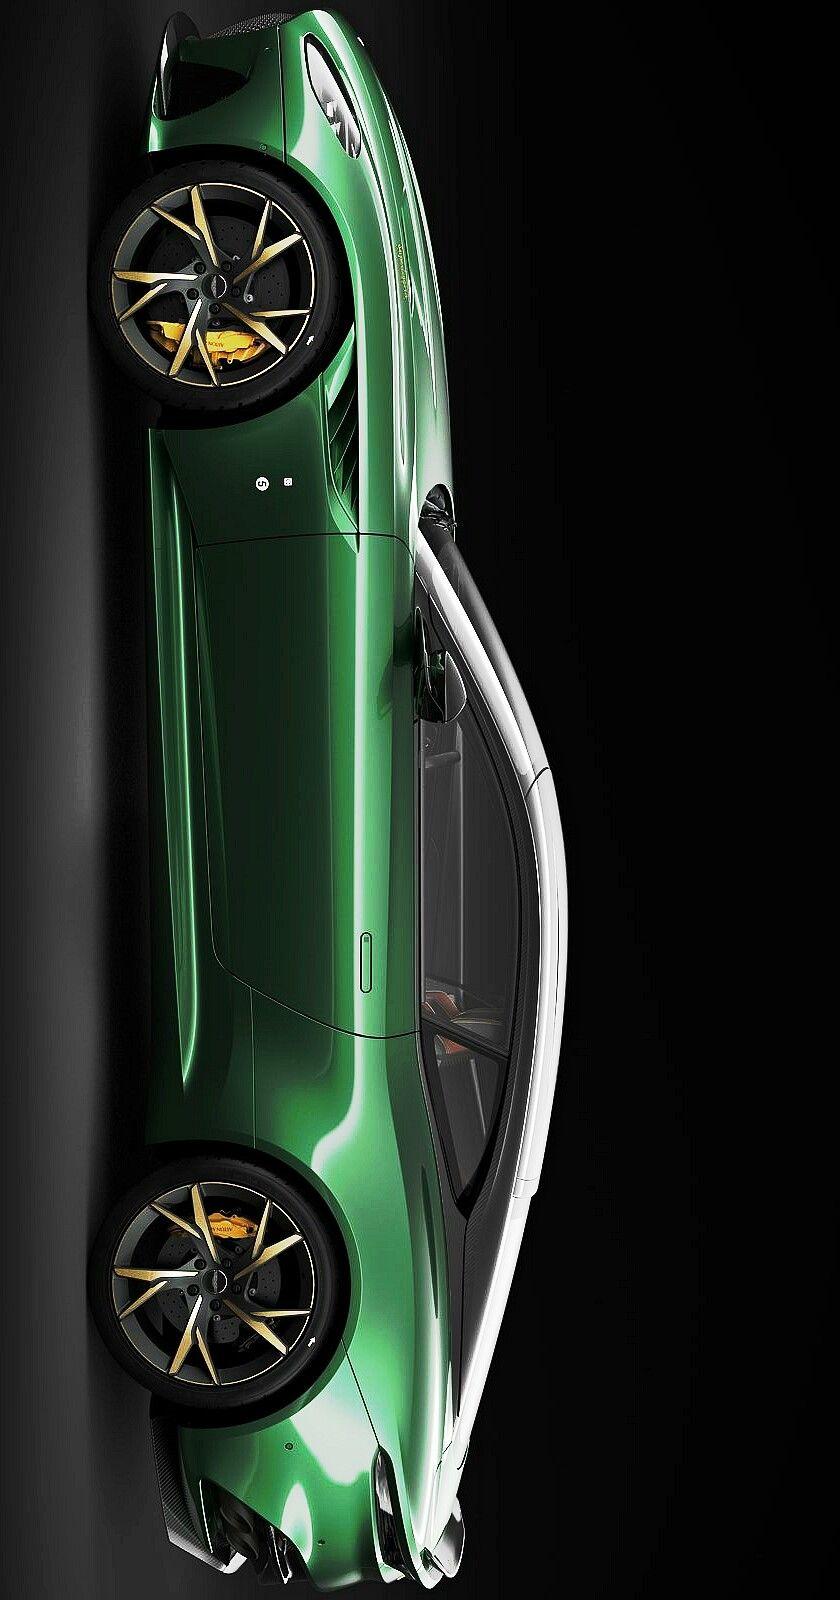 2019 Aston Martin Dbs 59 Enhanced By Vonmonski Arabalar Araba